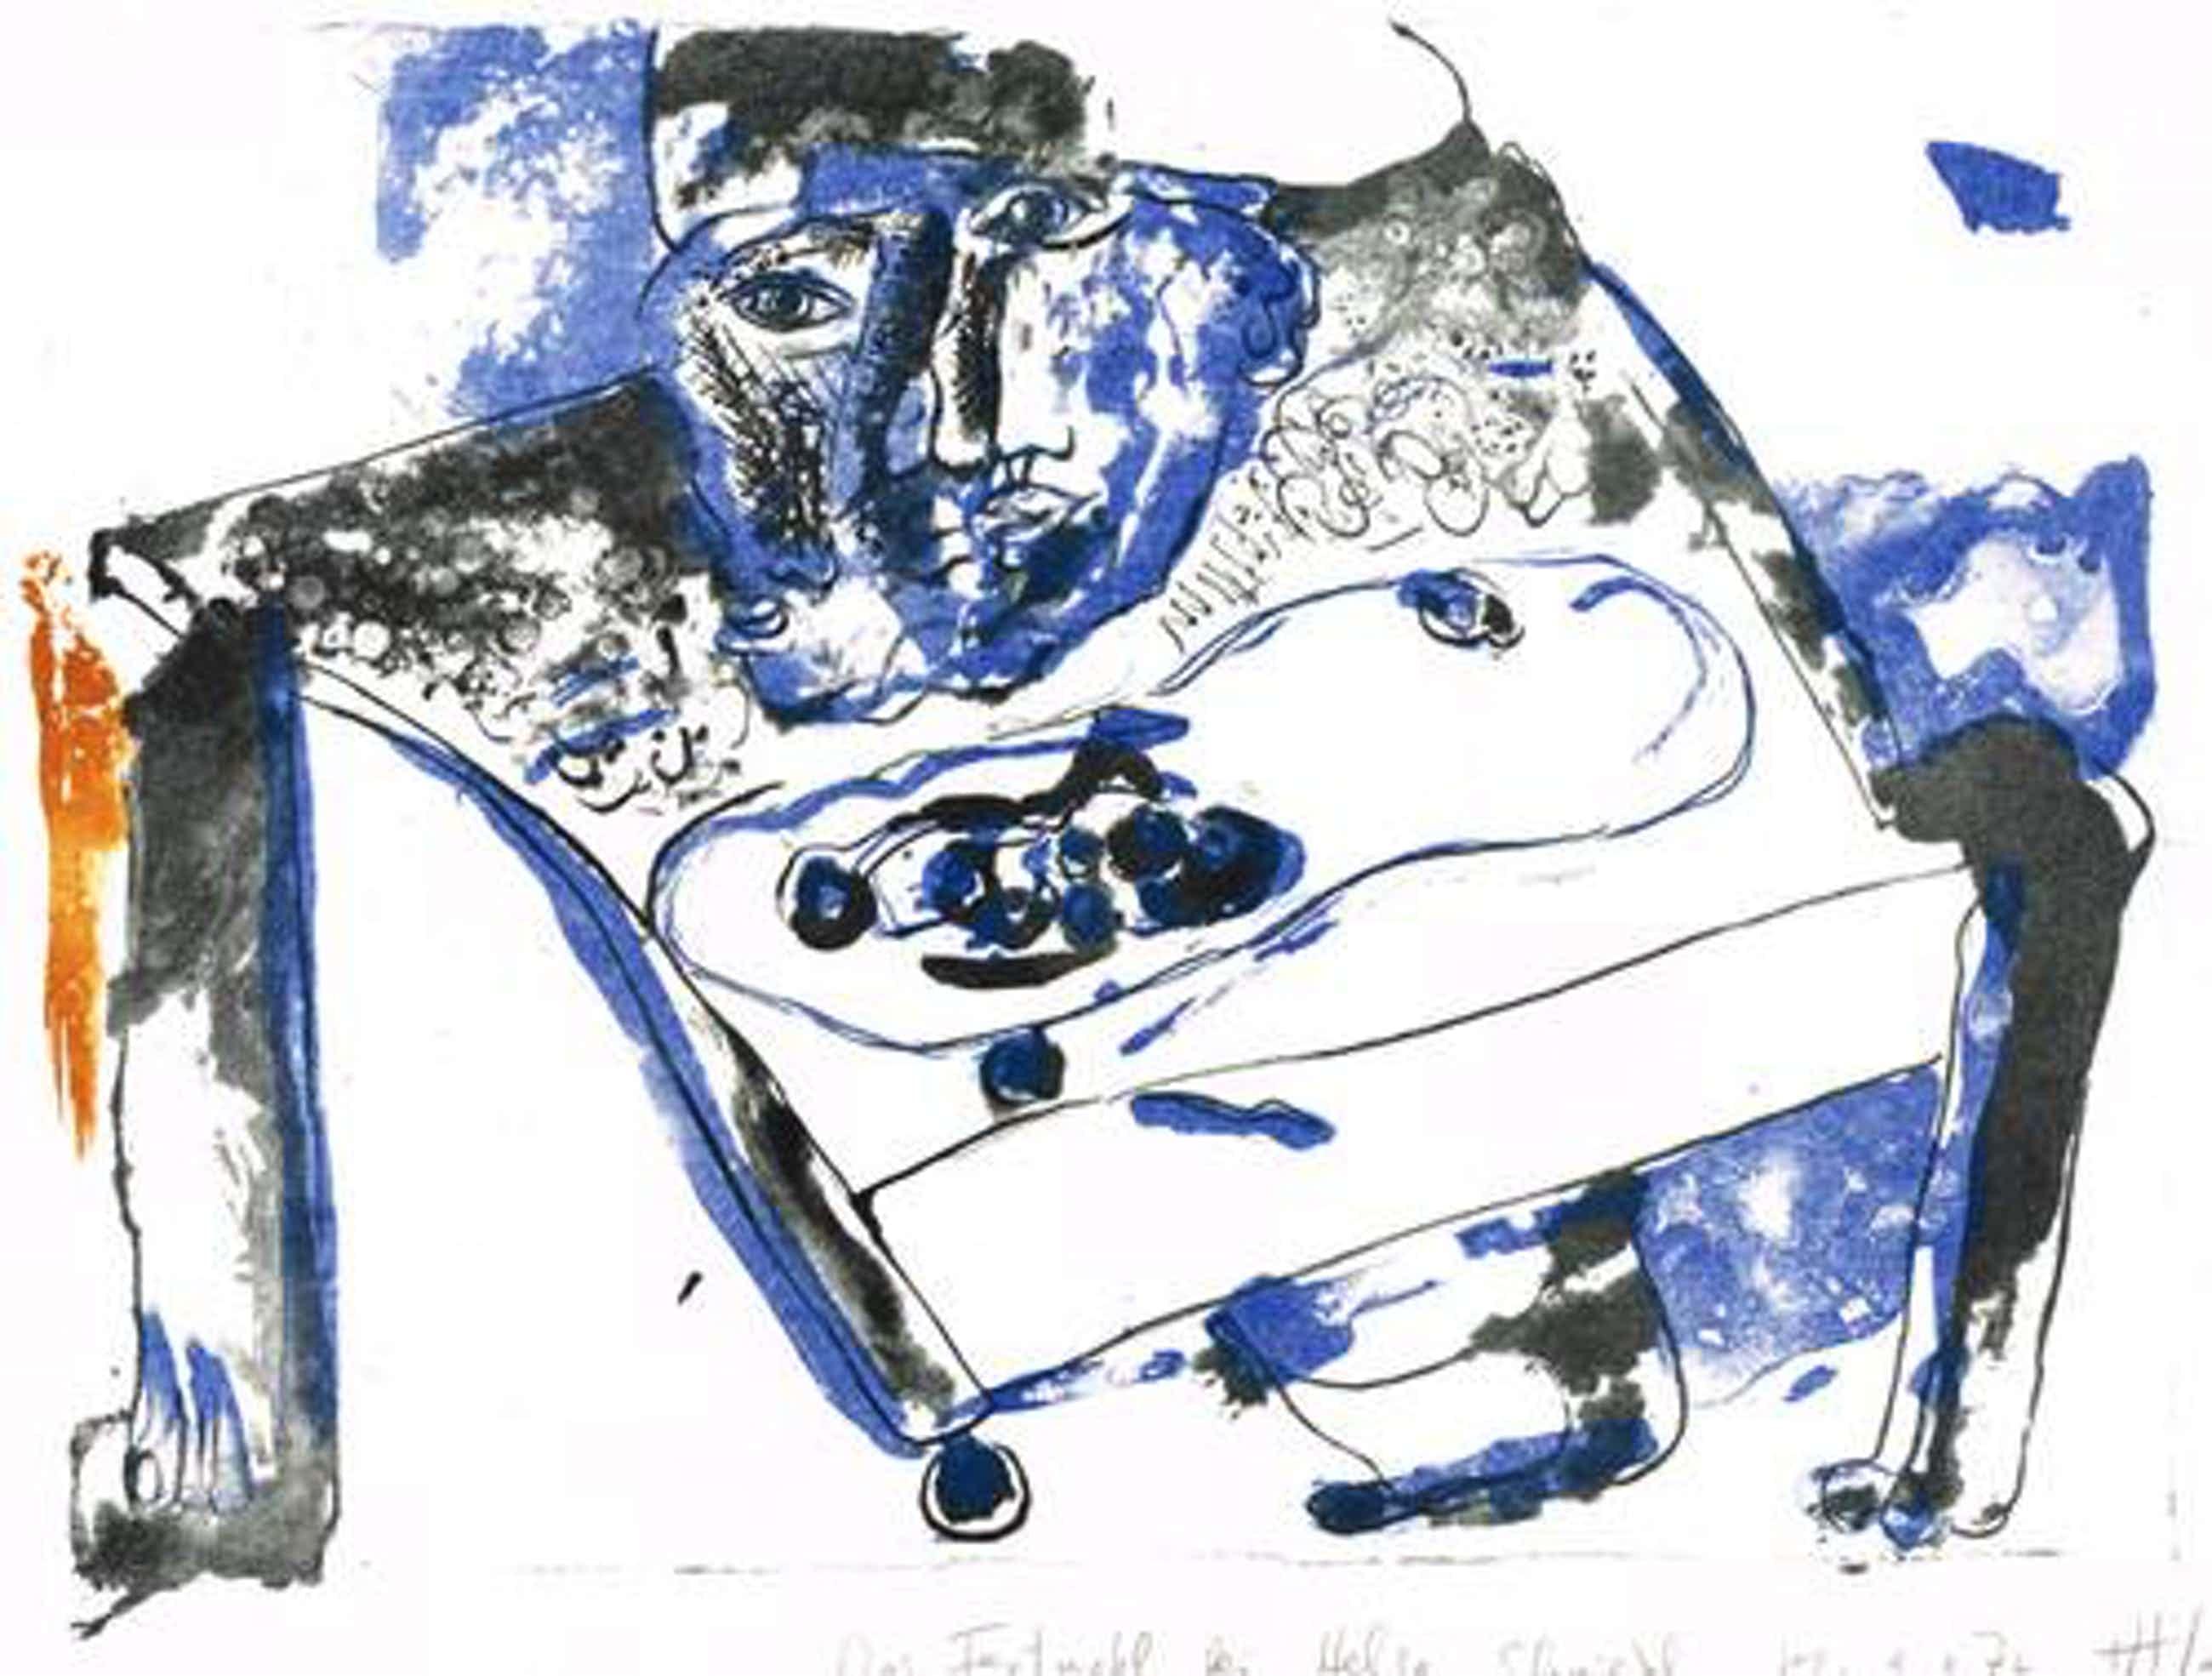 Atila Biro - Das Festmahl, Farblithographie,1972 kopen? Bied vanaf 215!